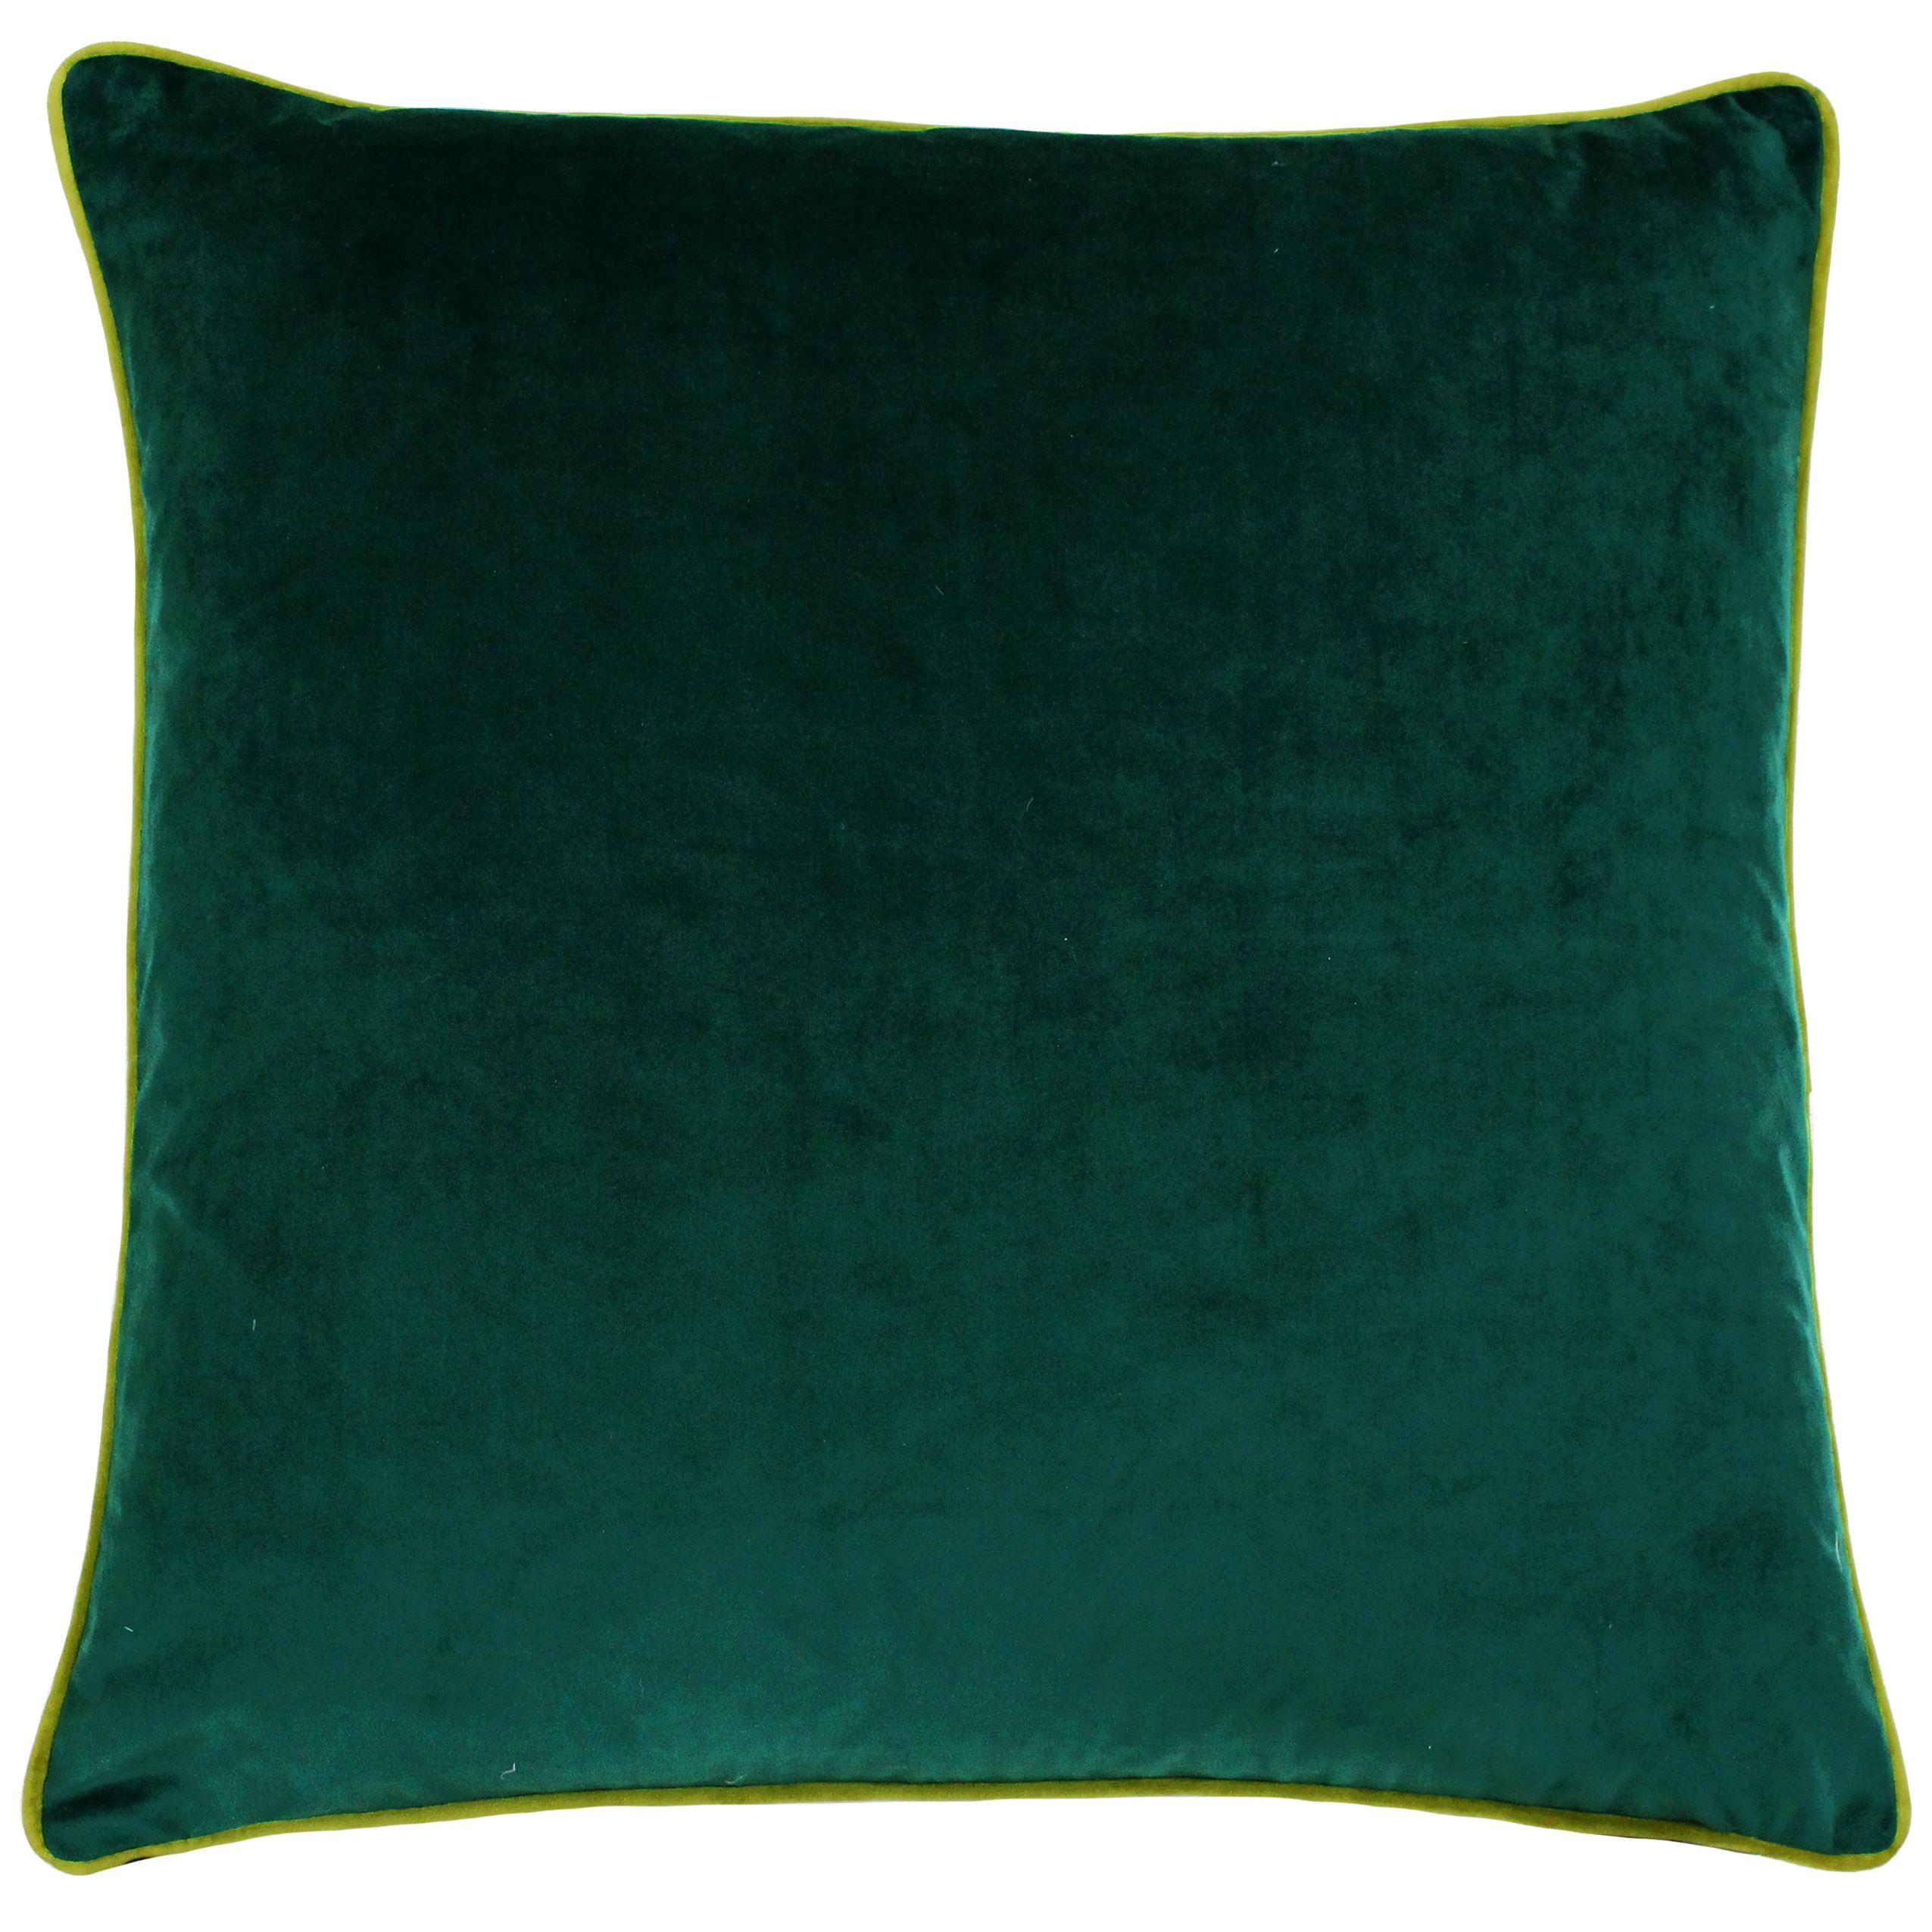 Meridian 55X55 Poly Cushion Eme/Mos